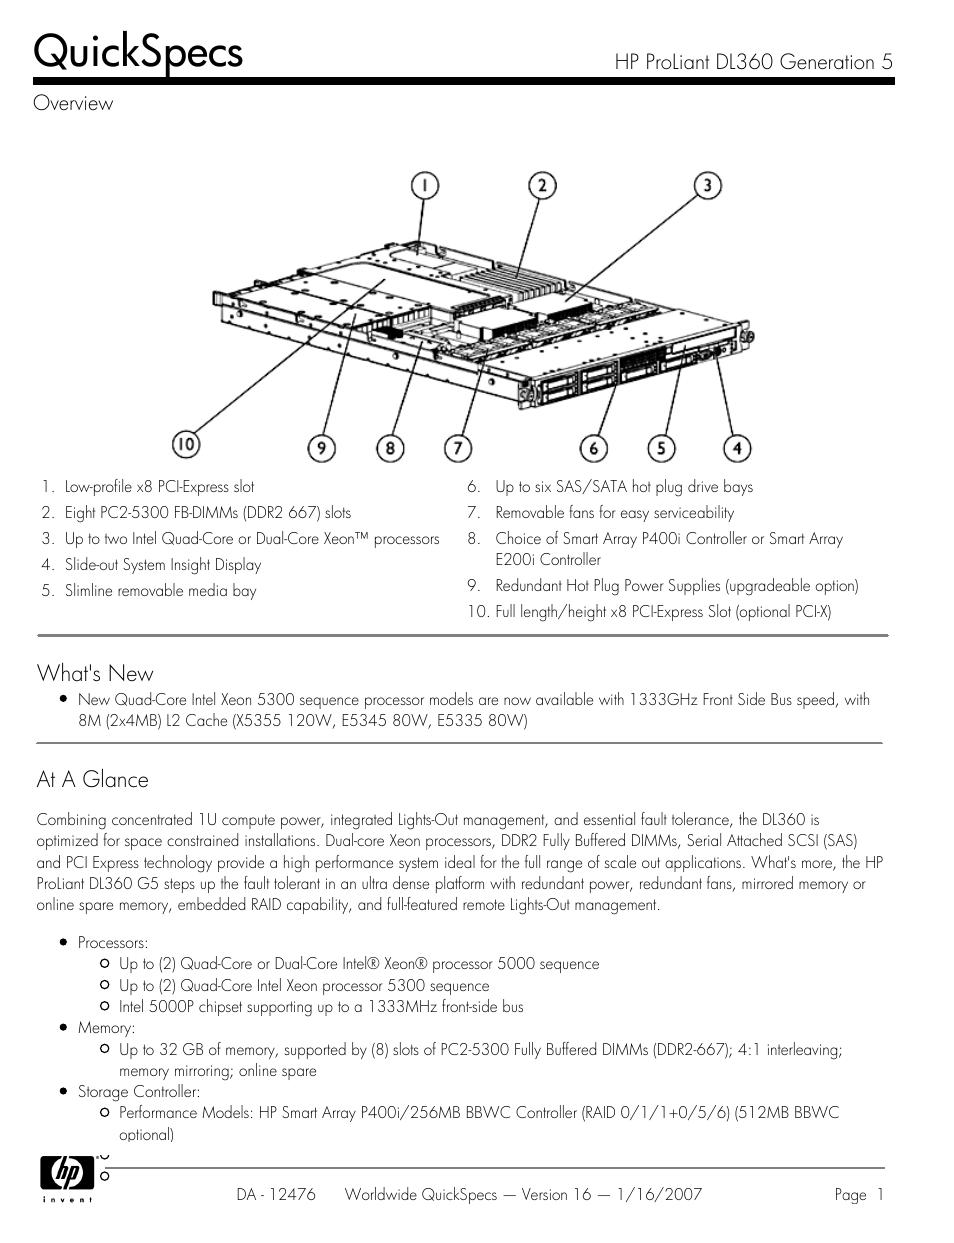 Hp smart array e200 controller user guide pdf.